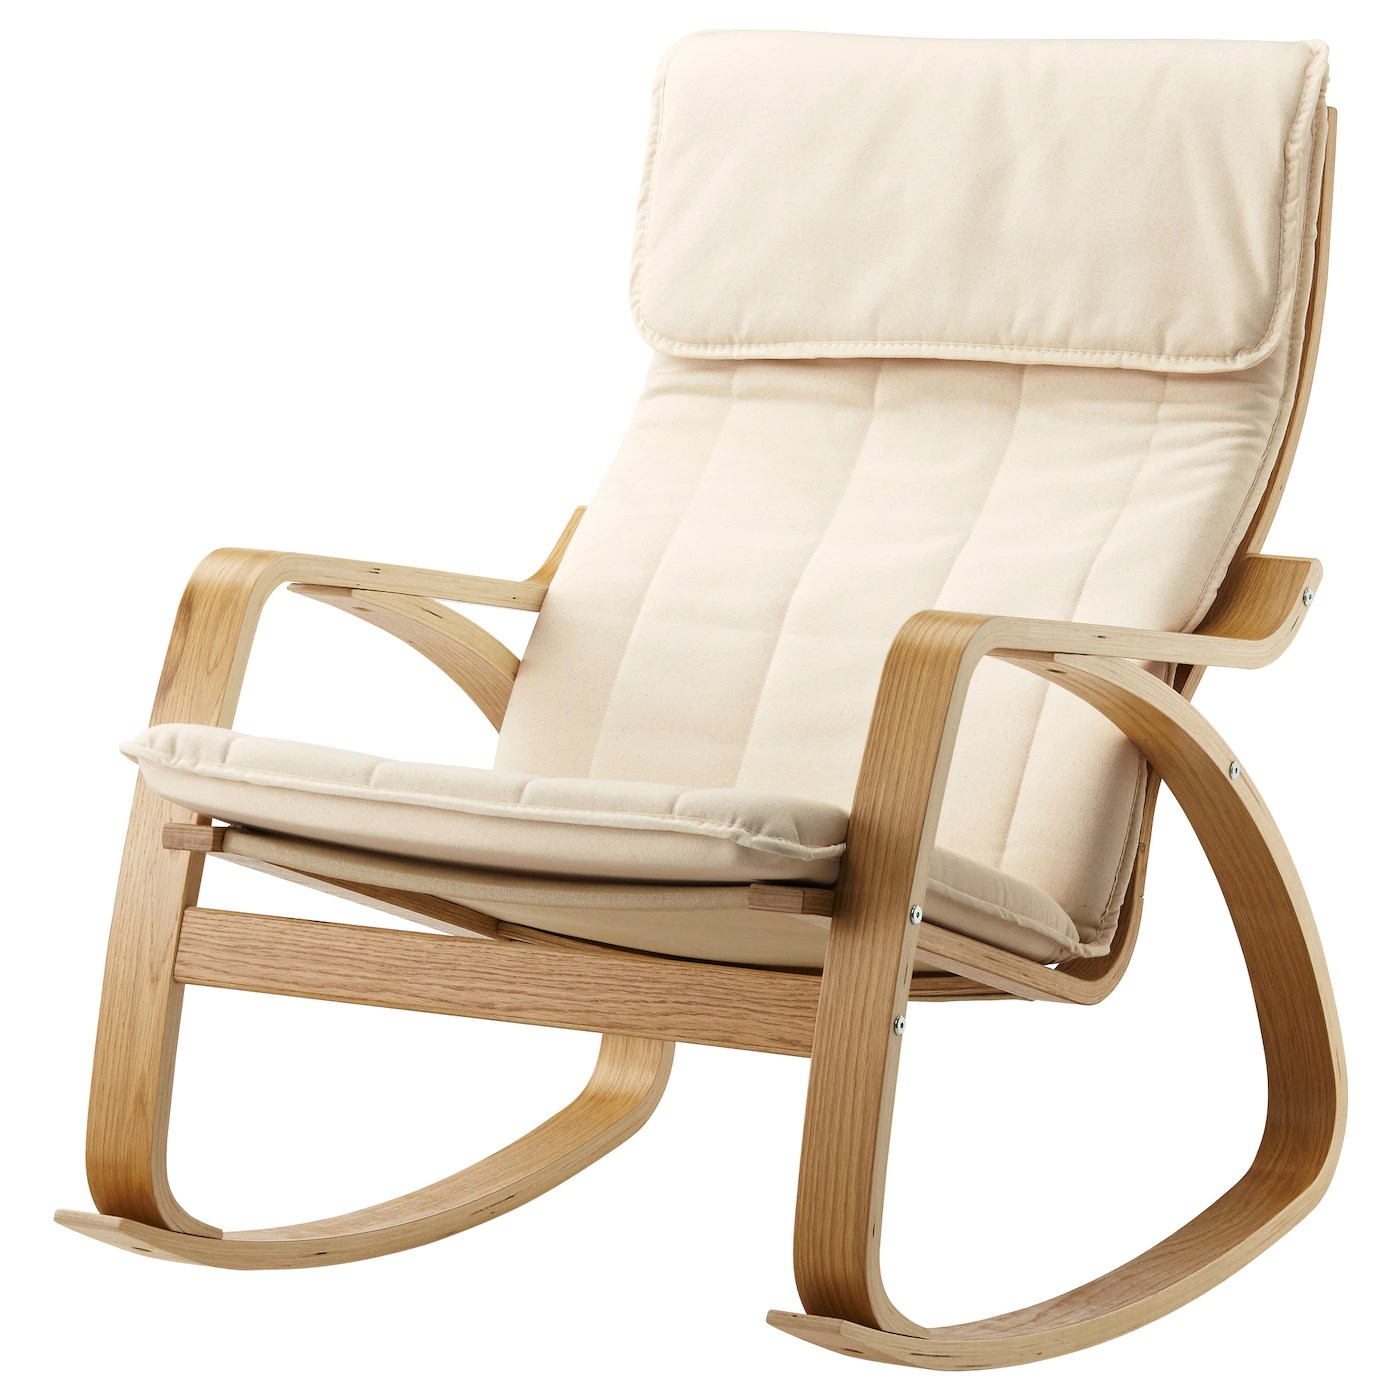 ikea white rocking chair foldable dining chairs poÄng oak veneer ransta natural